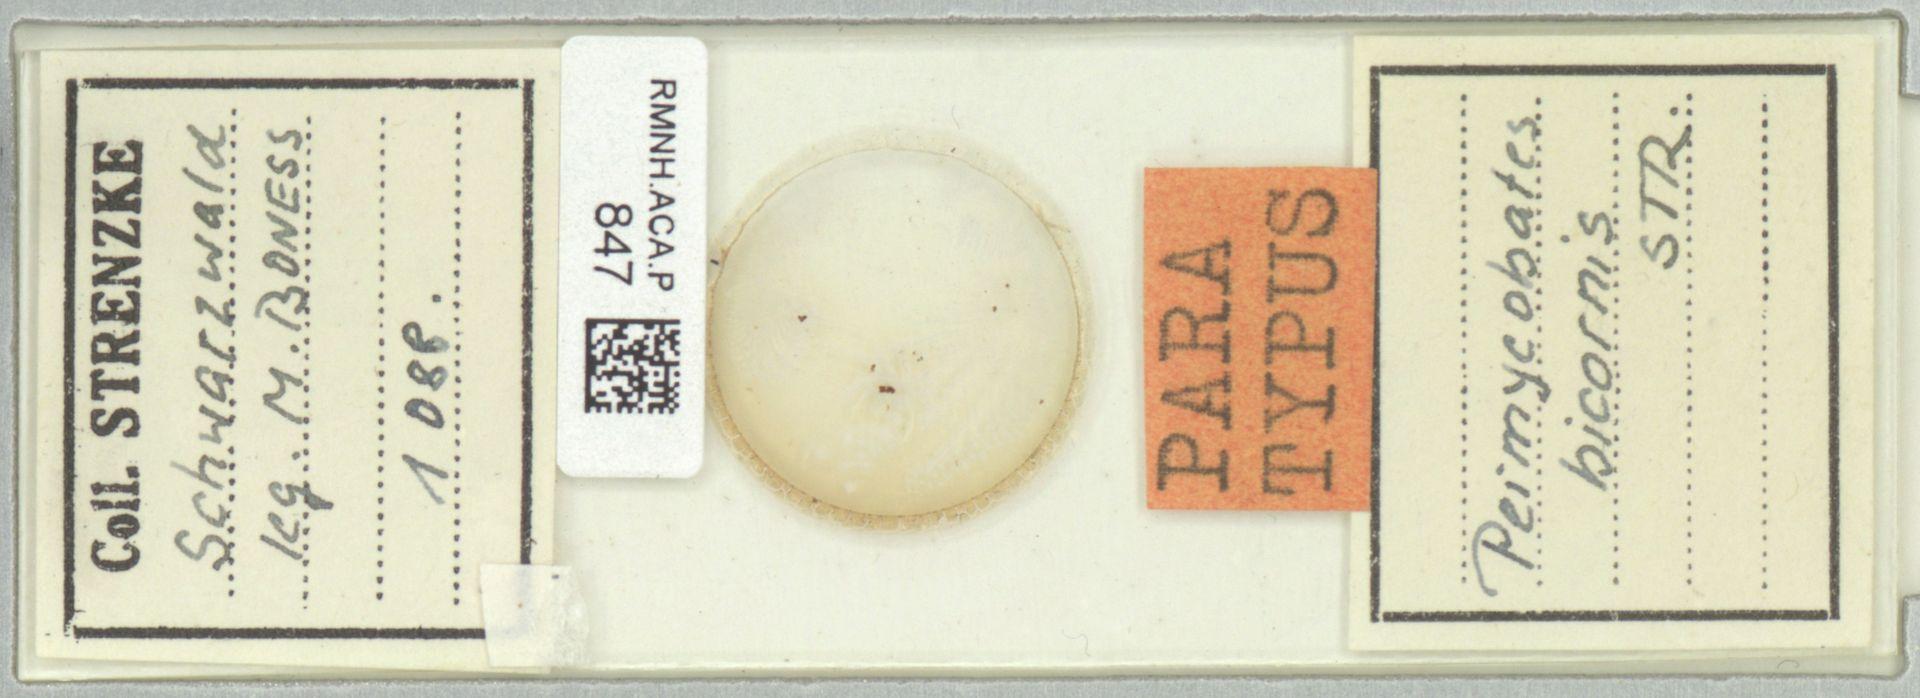 RMNH.ACA.P.847 | Permycobates bicornis Strenzke